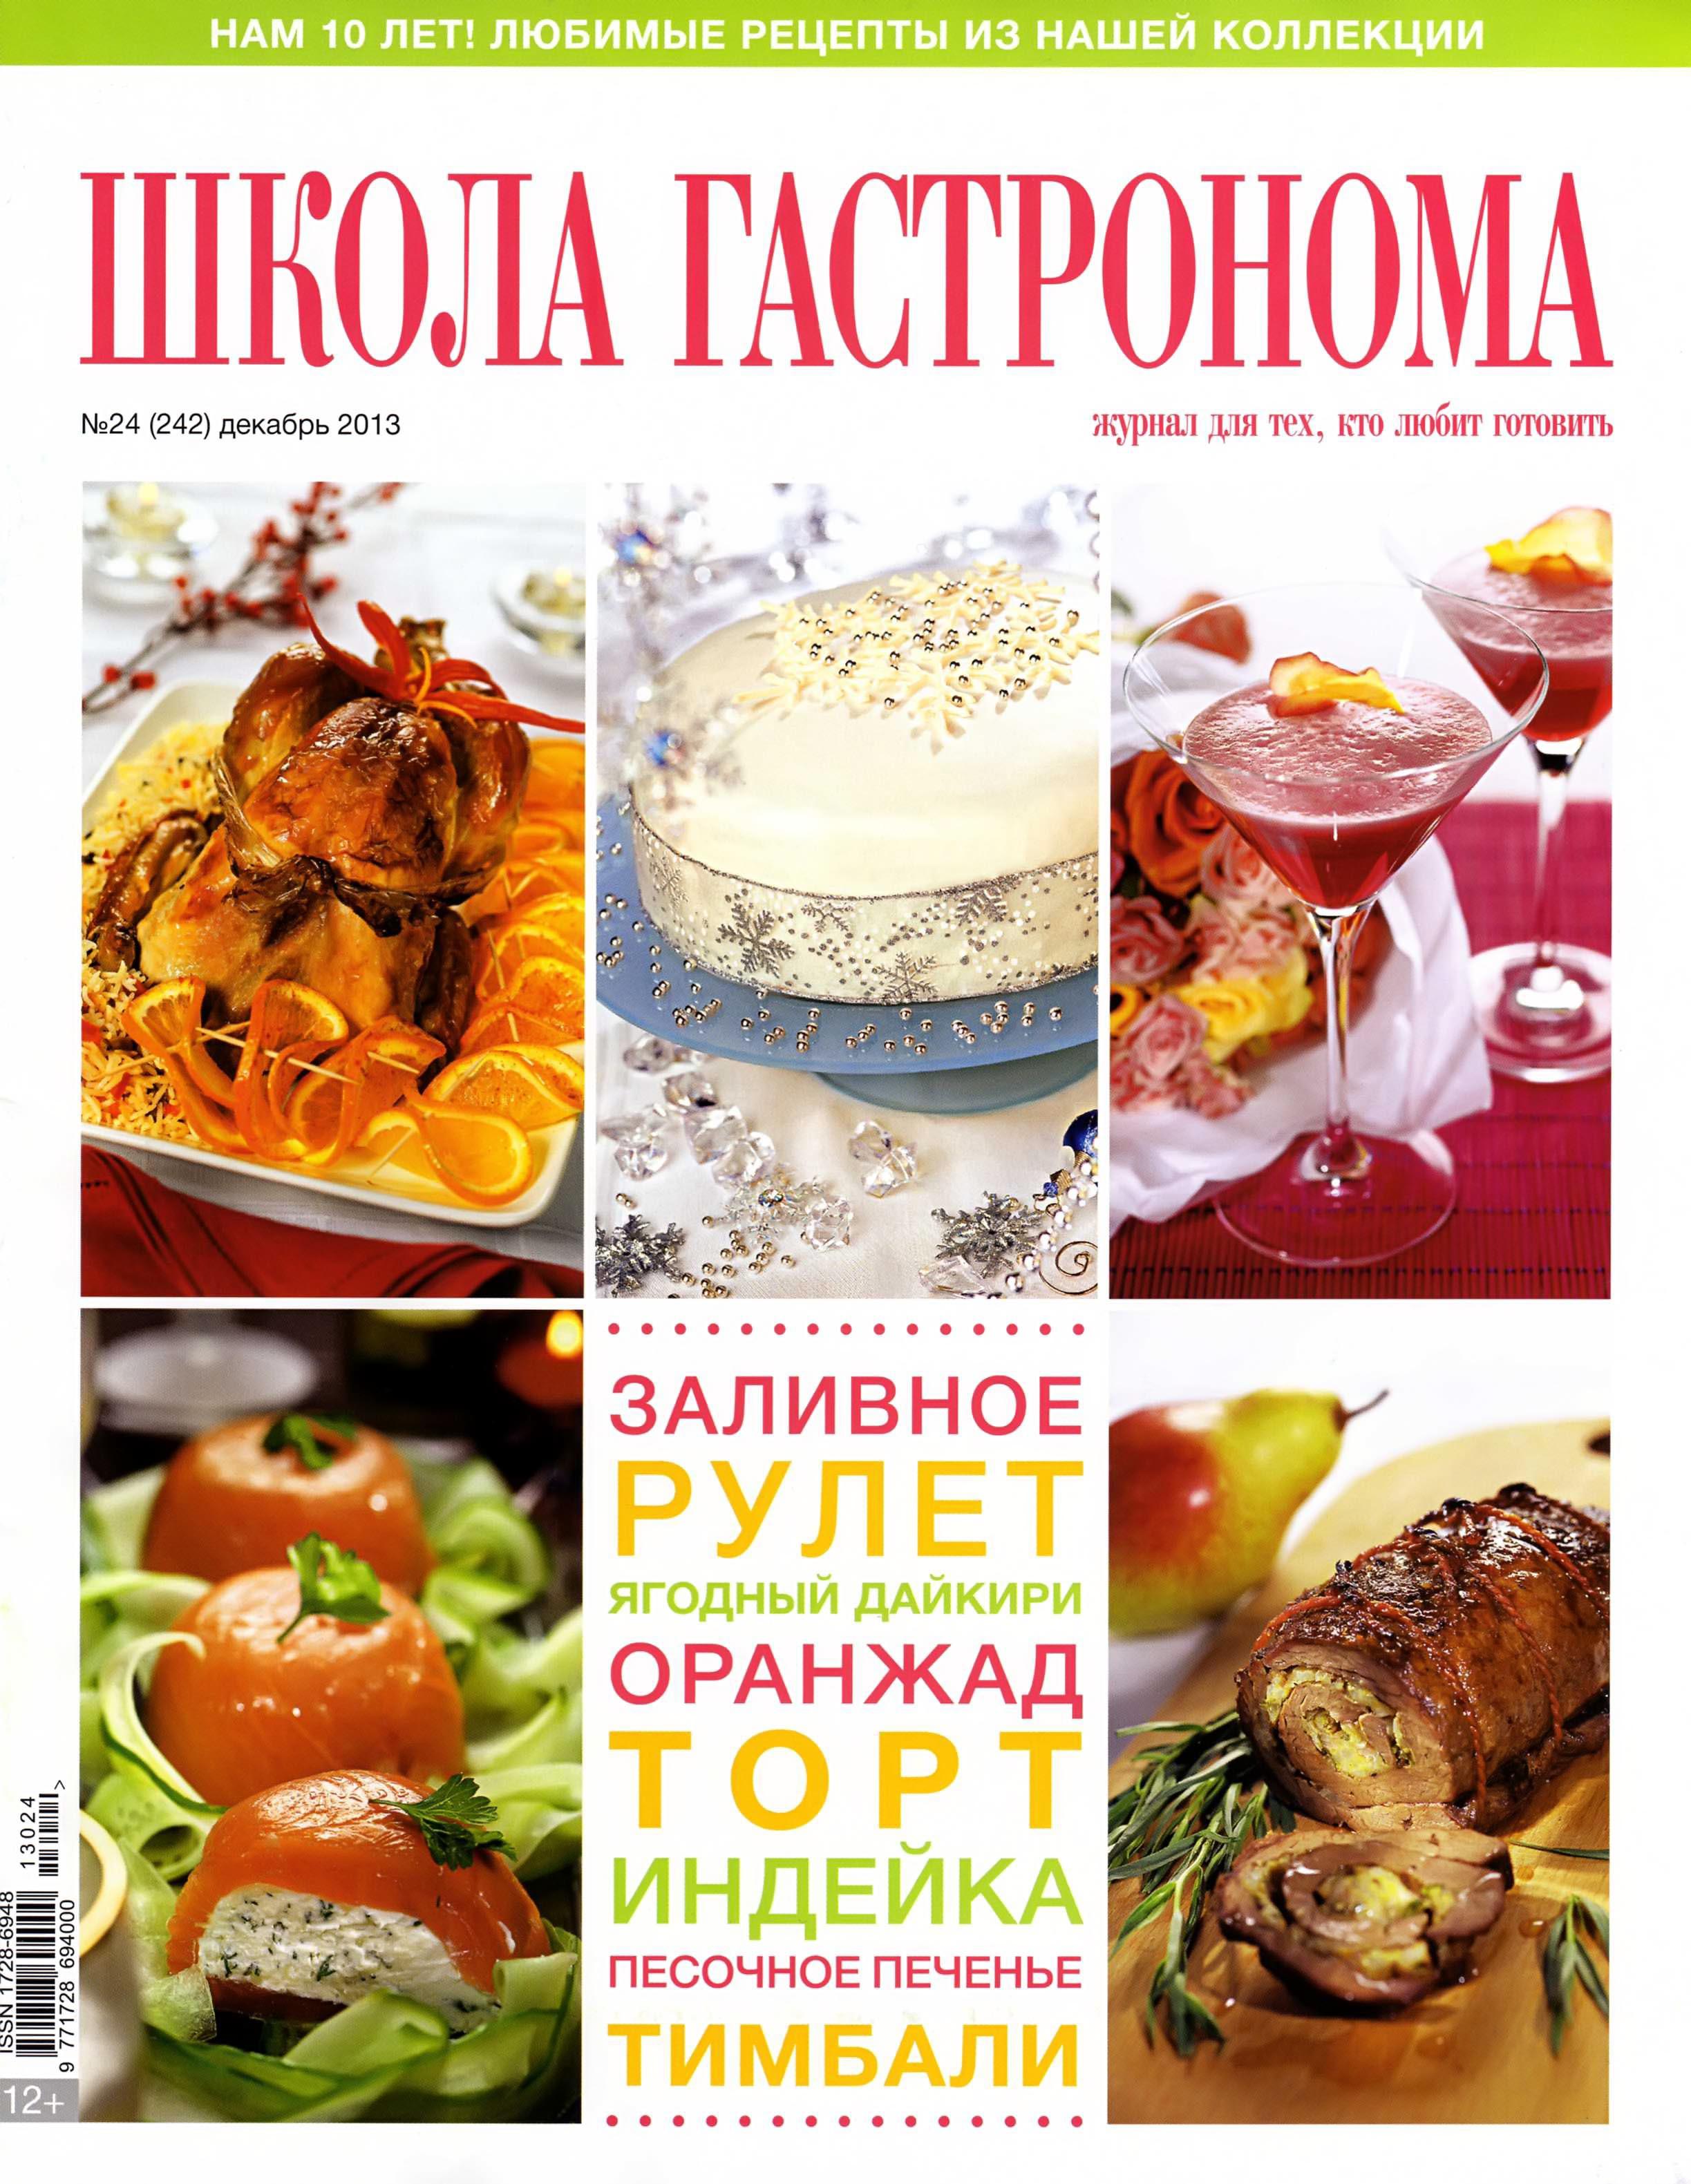 SHkola gastronoma    24 2013 goda Школа гастронома